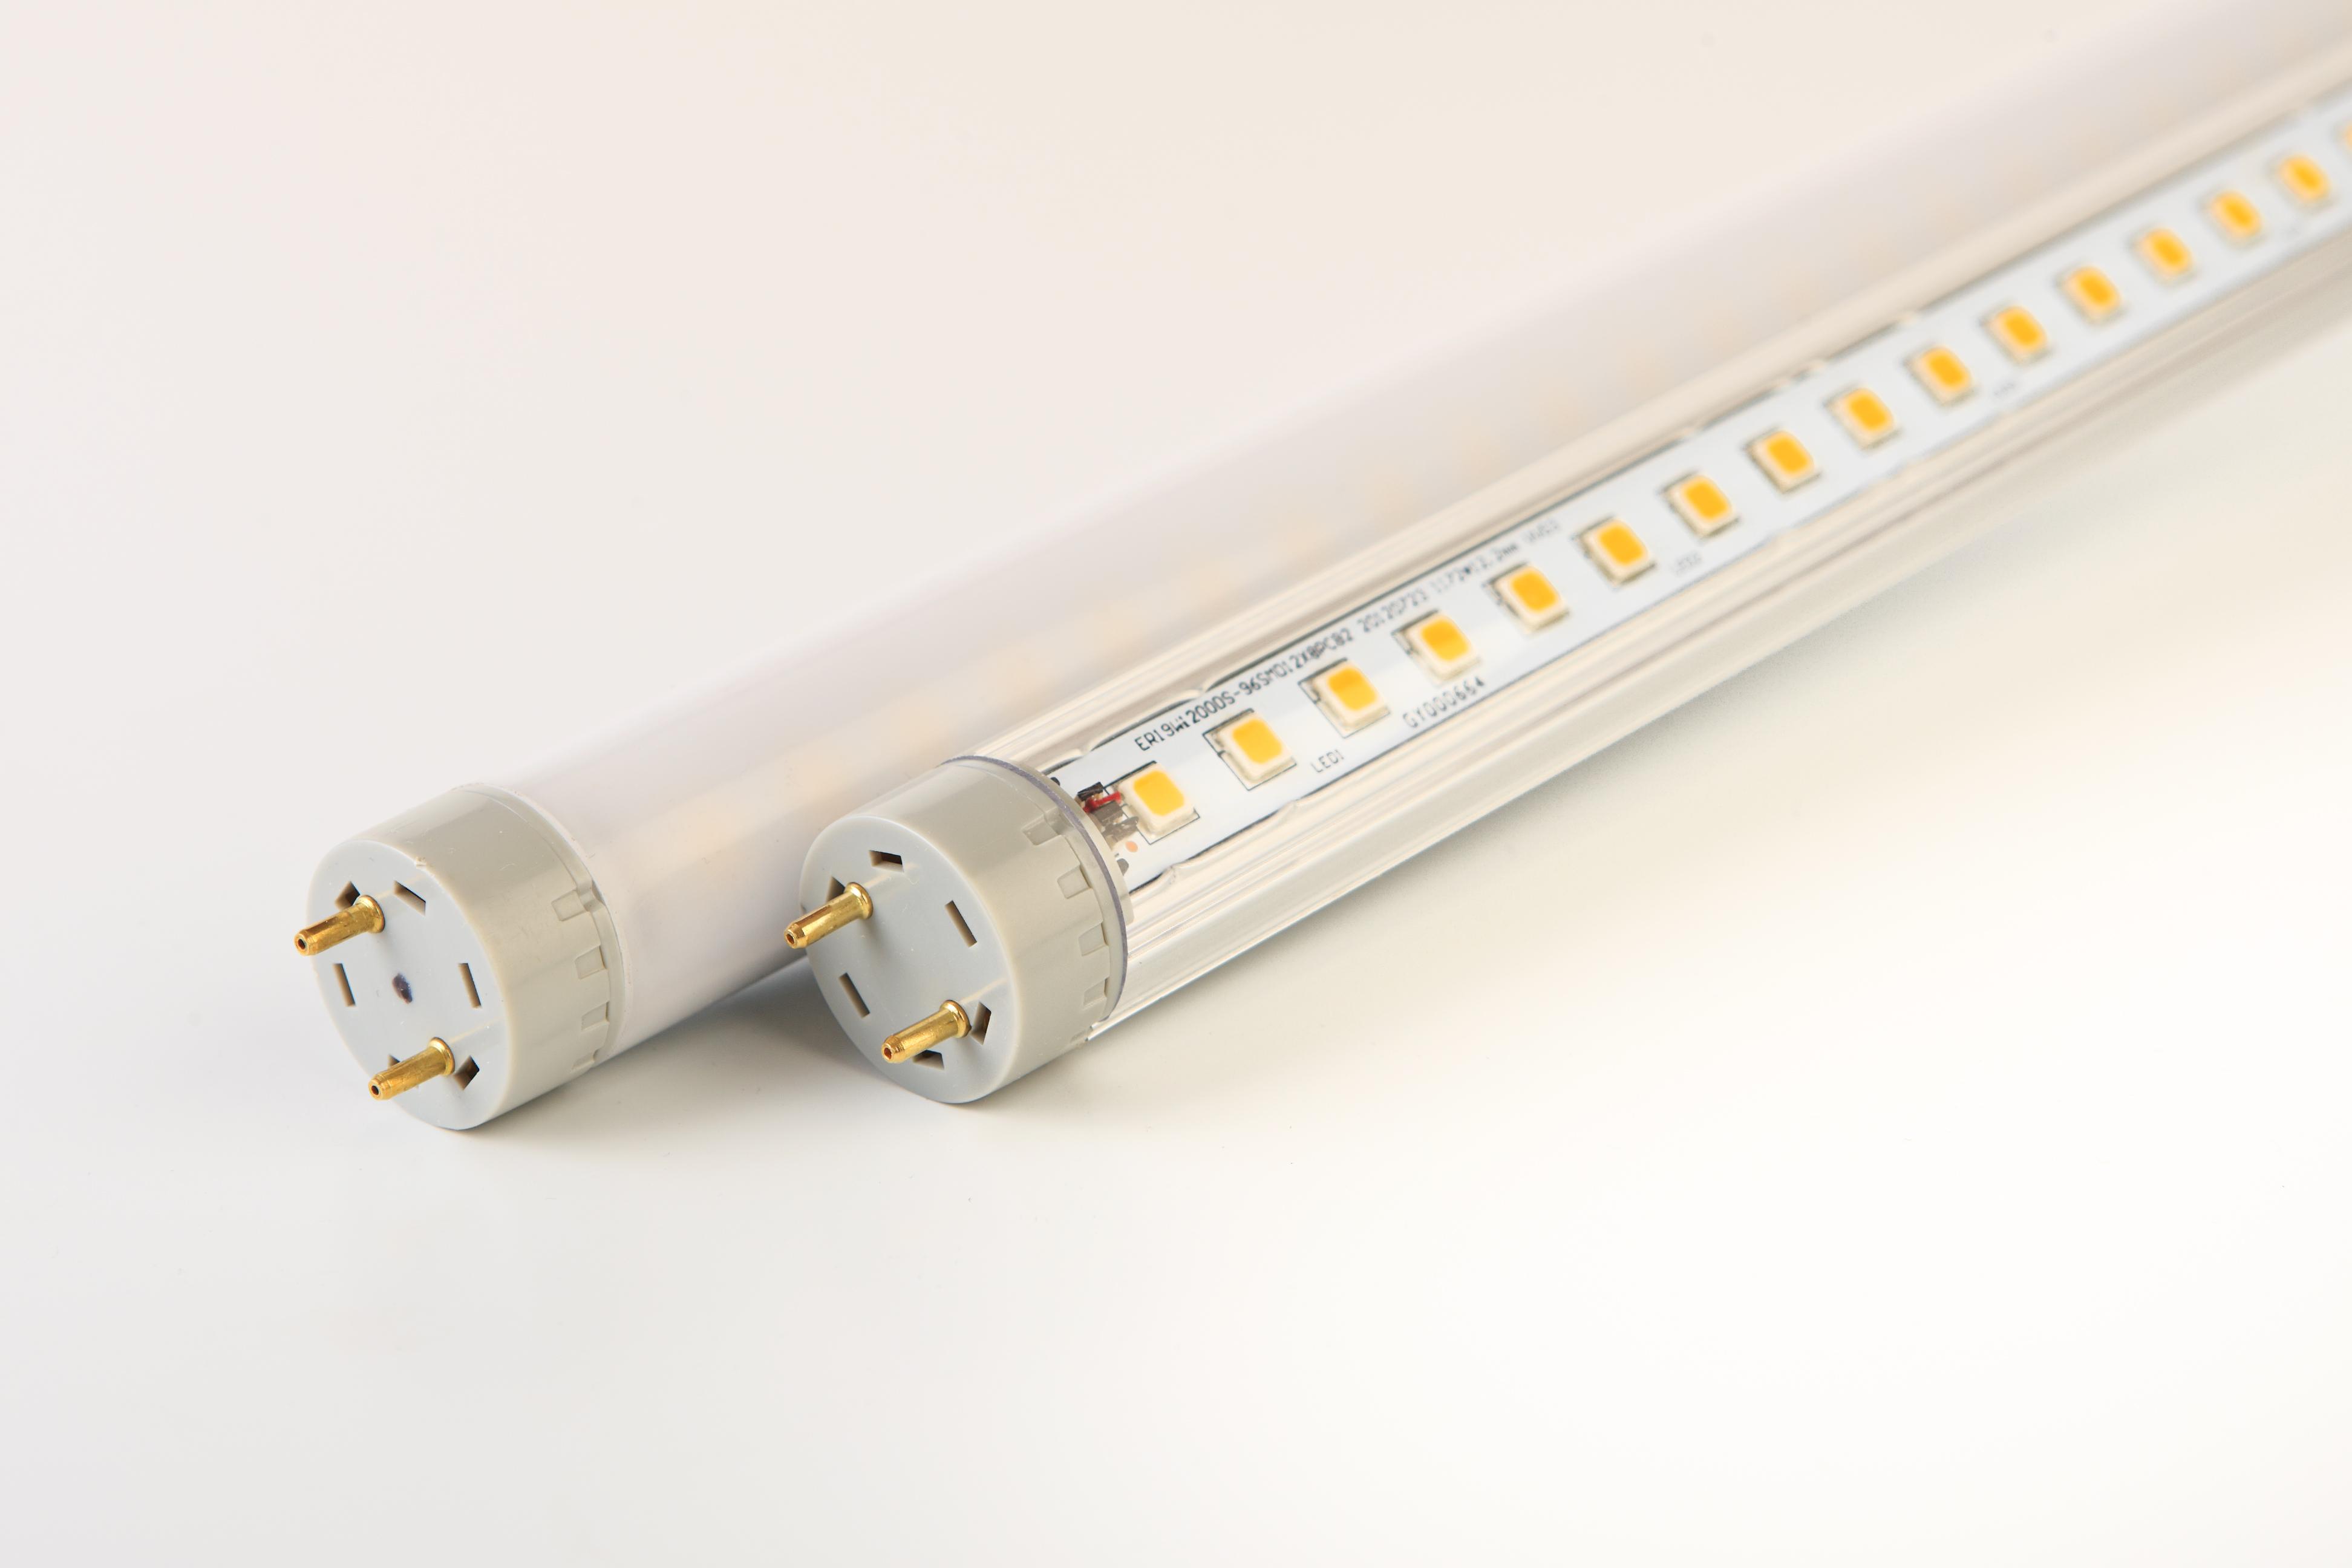 Ungdommelige G3 LED-lysrør med klar overflate - Valtavalo RH39